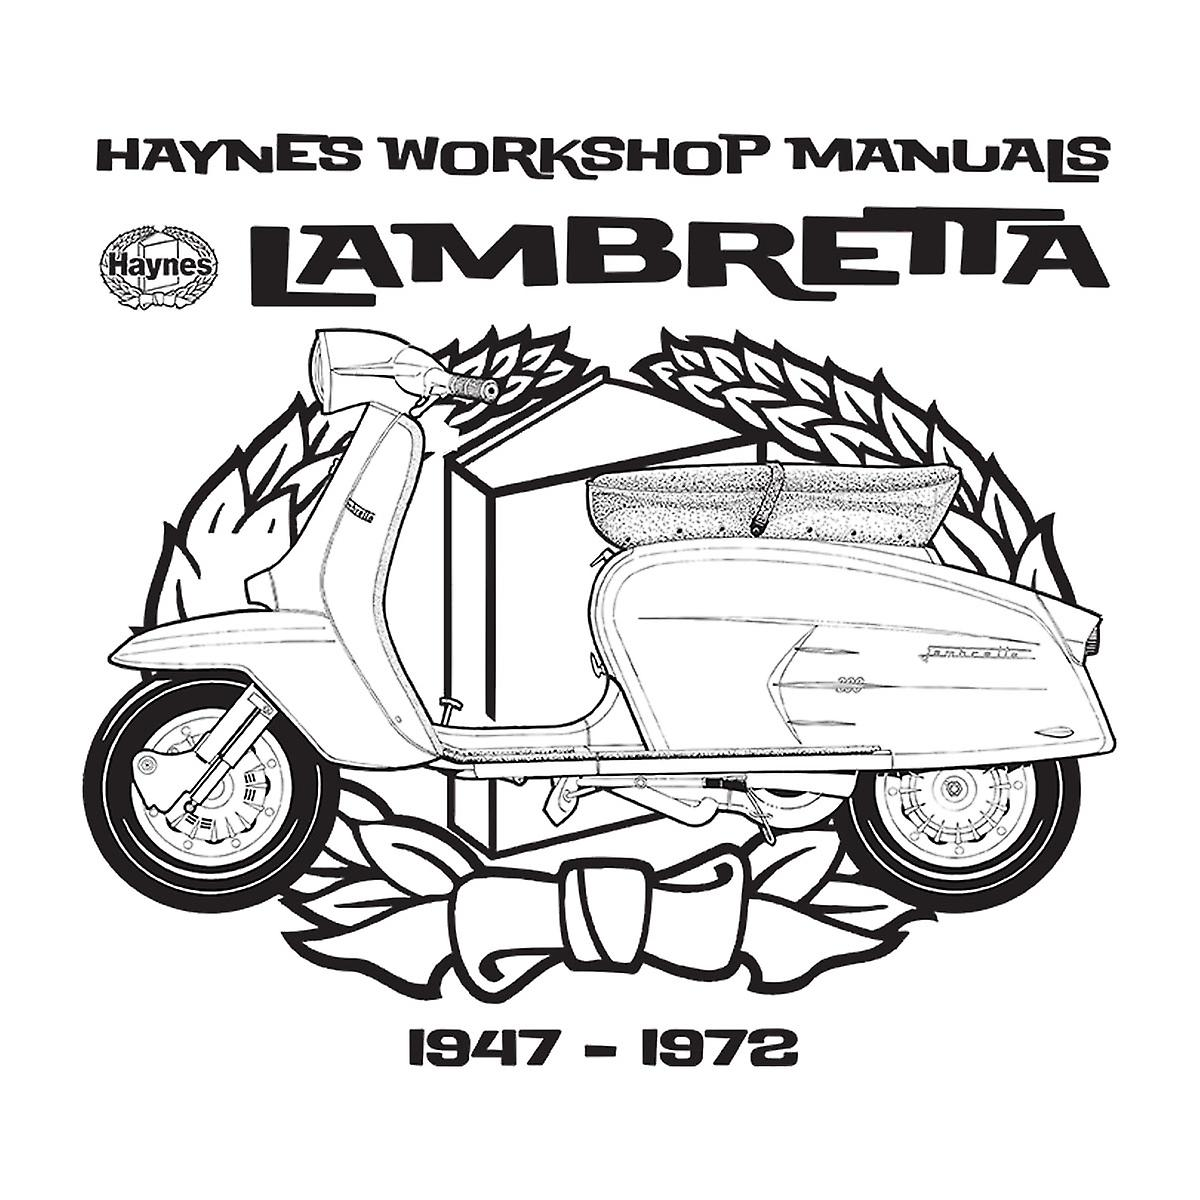 Haynes Owners Workshop Manual Lambretta 3 Men's Baseball